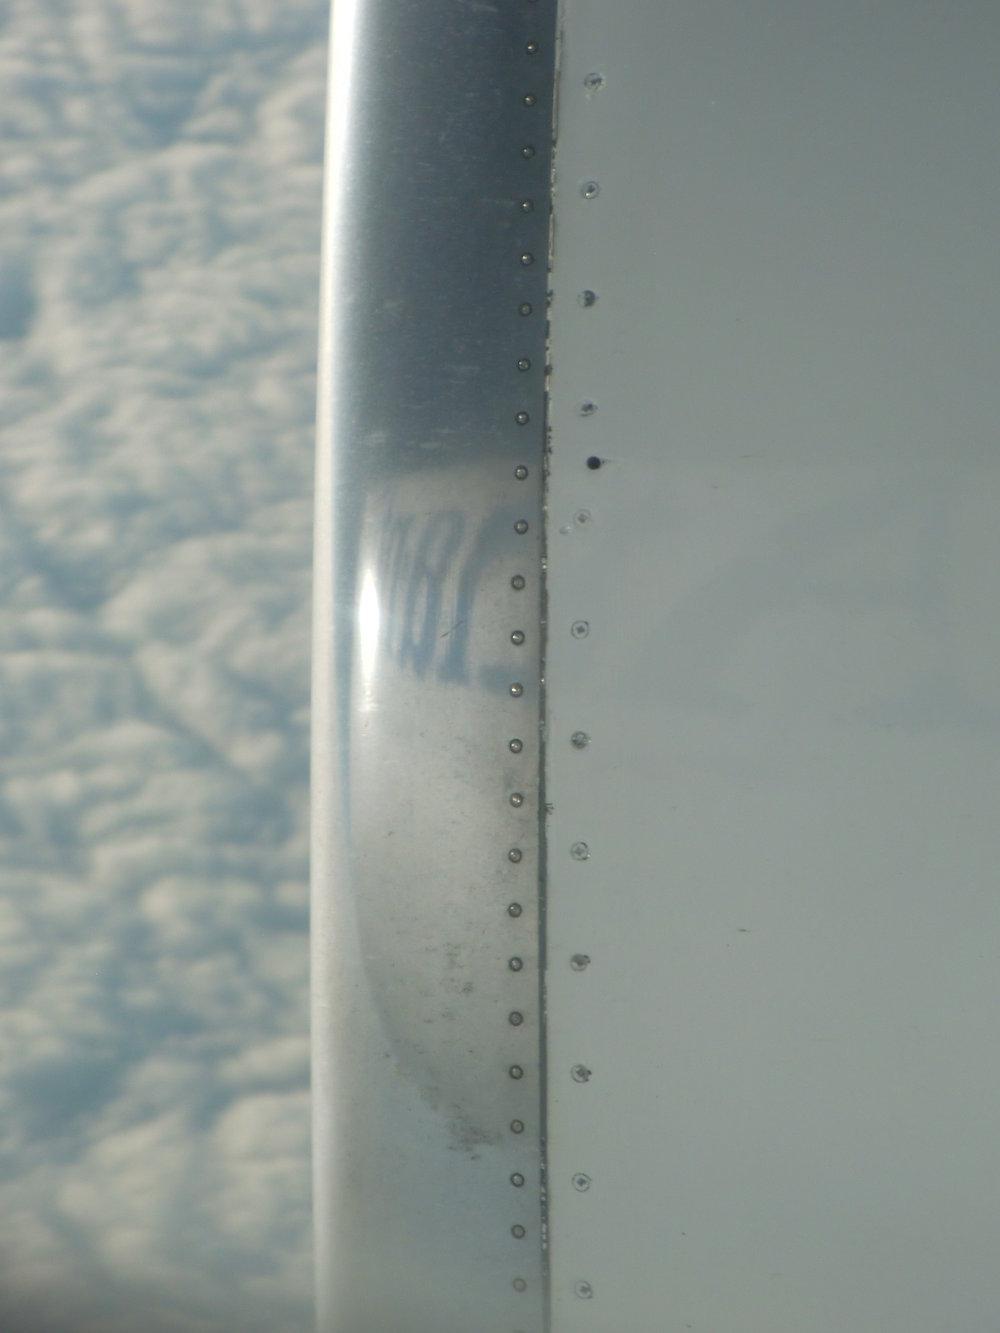 FLIEGER CIMG5869kn.JPG